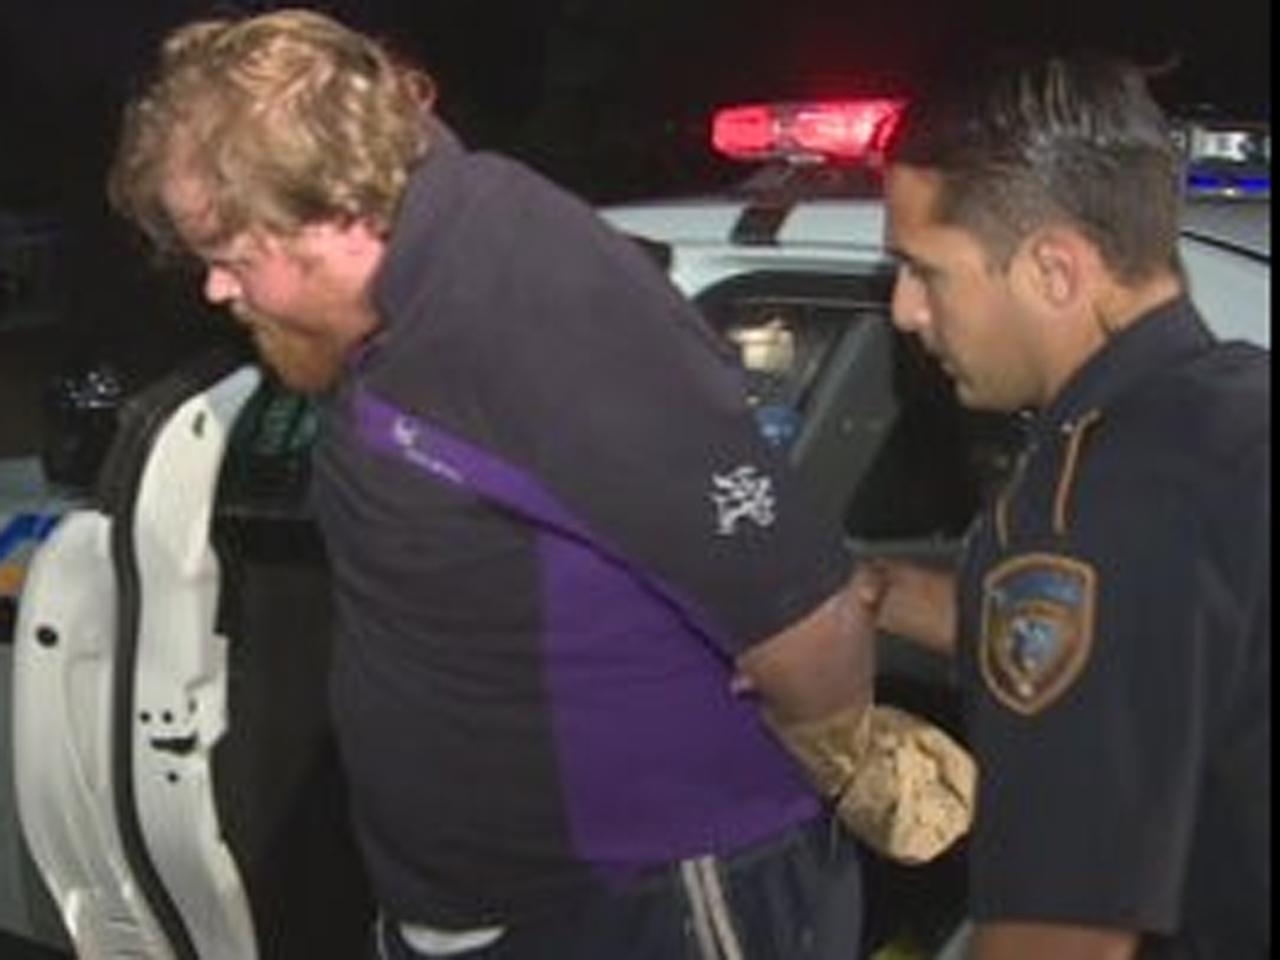 Suburban Houston shooting at home leaves 6 dead - CBS News